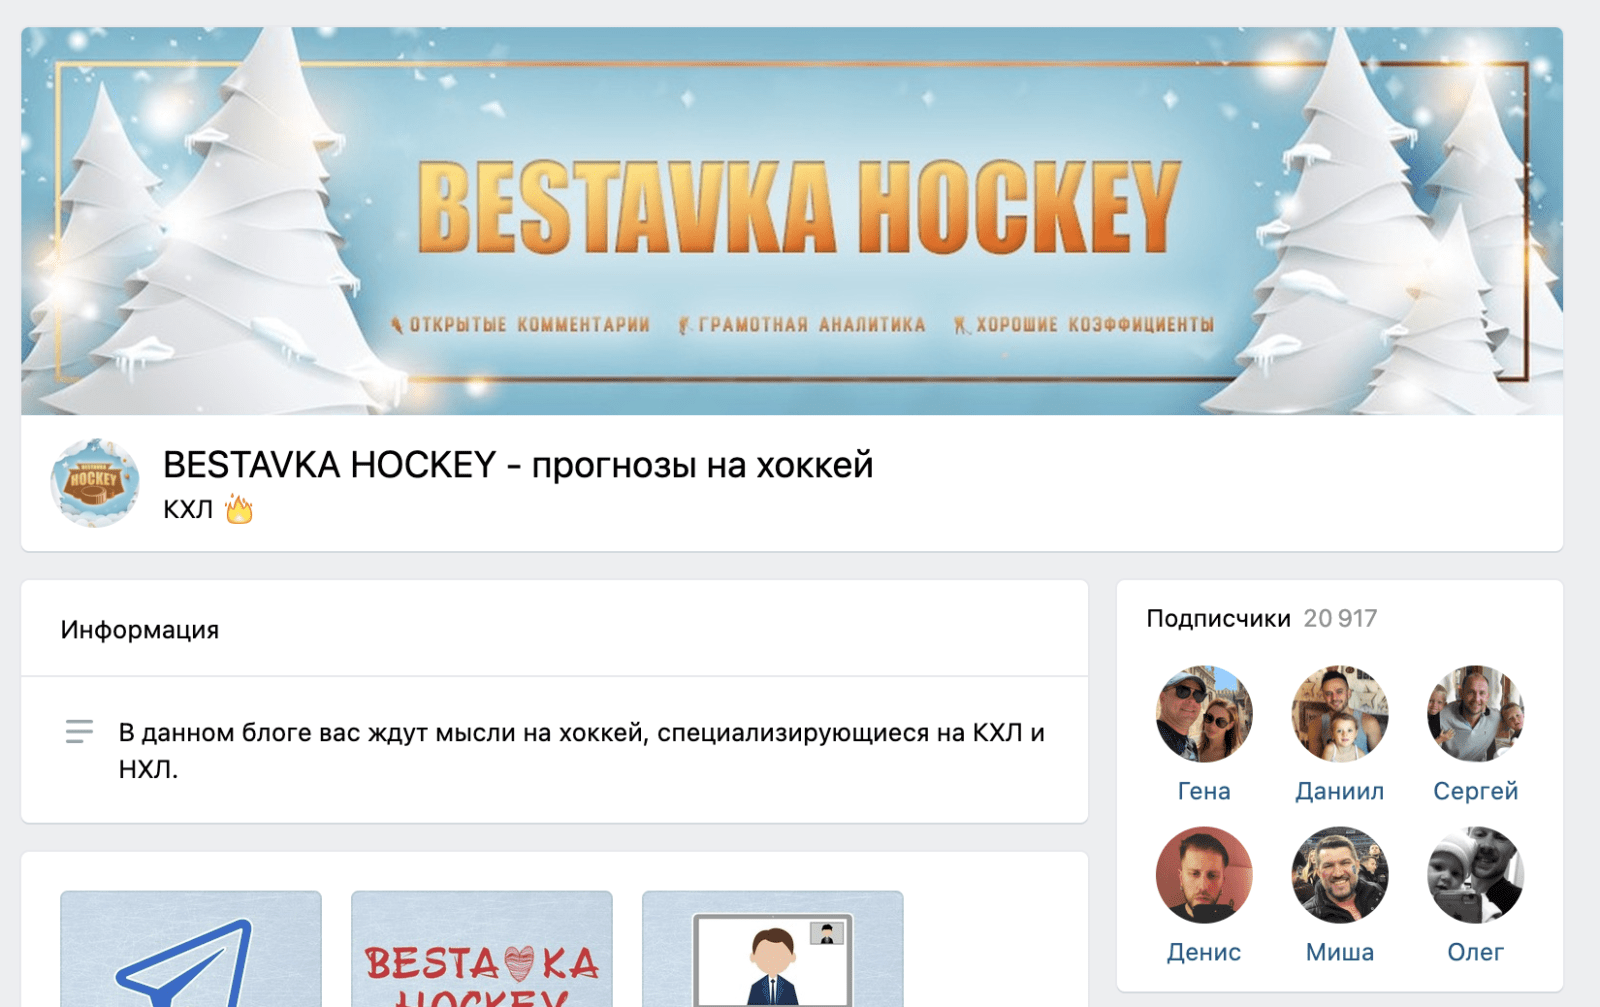 Группа ВК Bestavka hockey